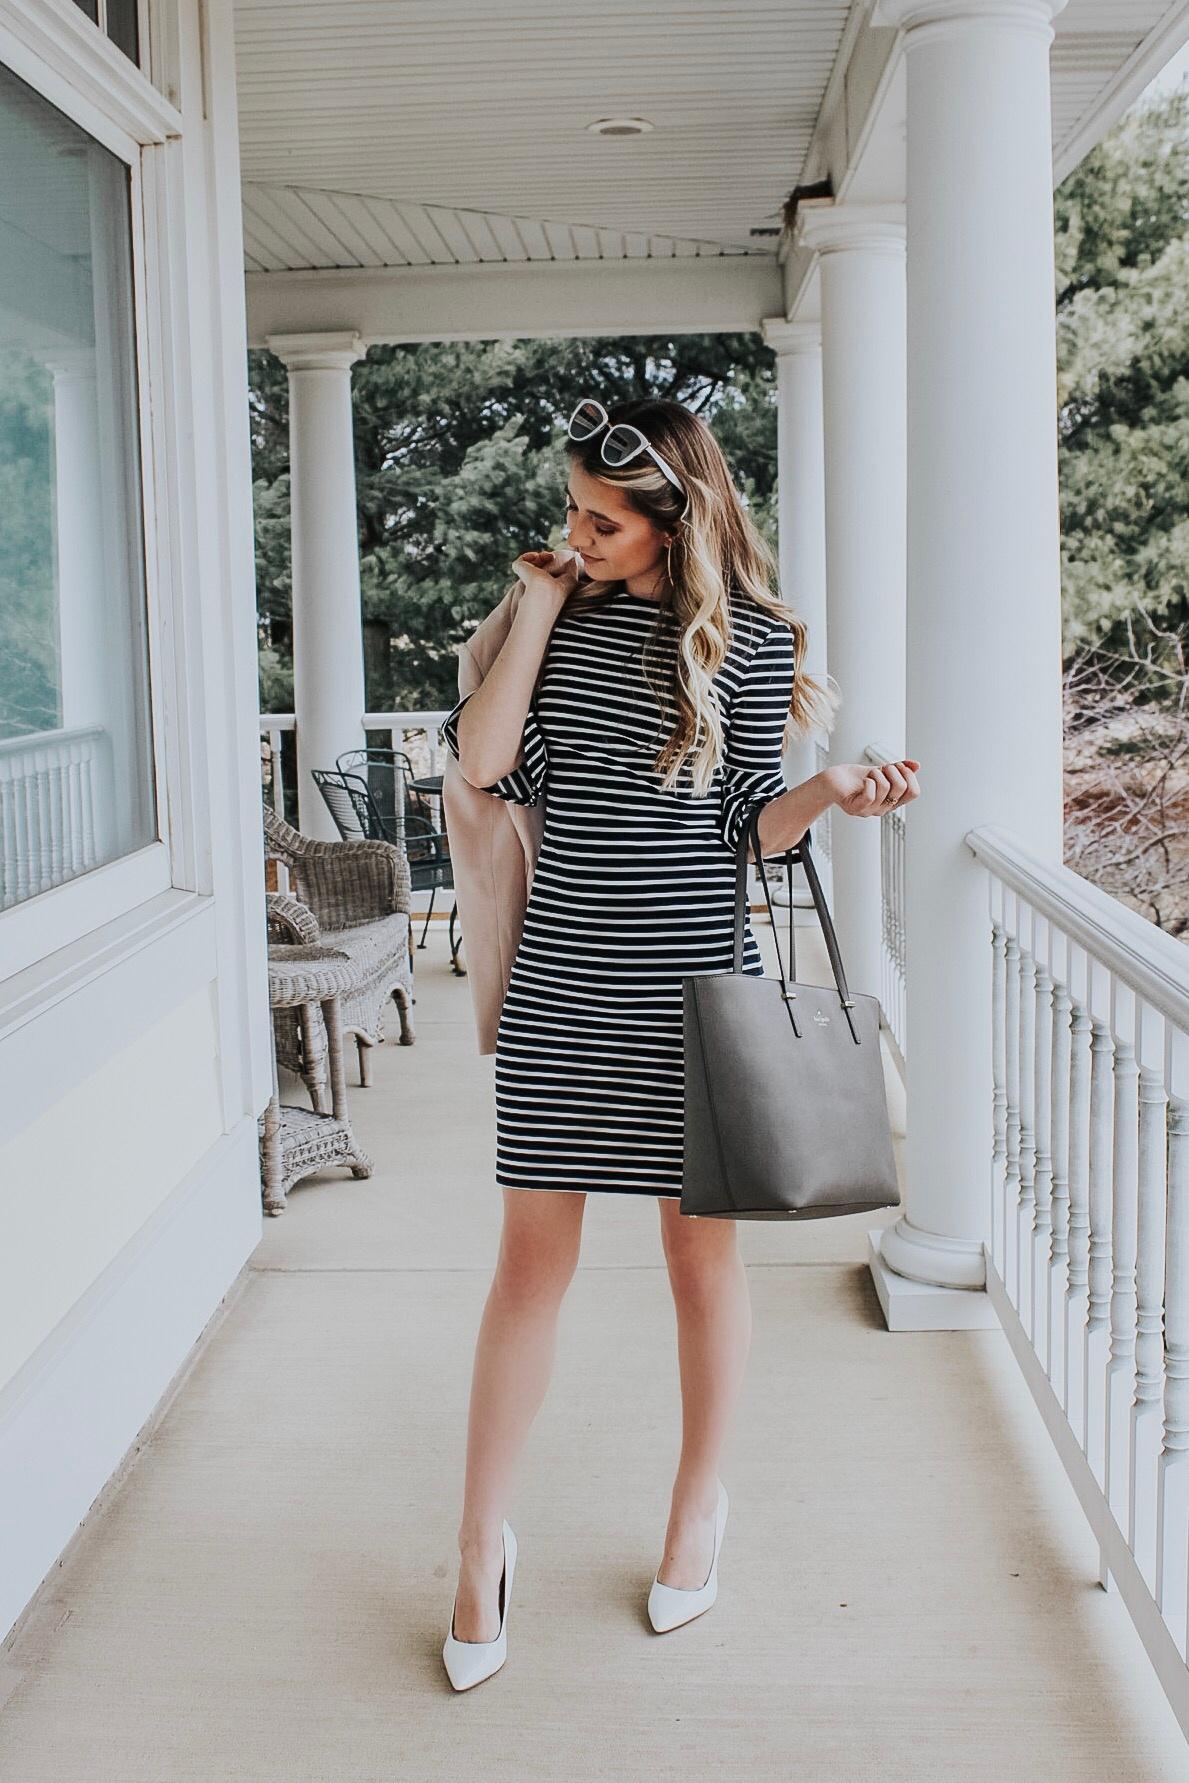 Business Professional Wear: Where I Shop on a Budget